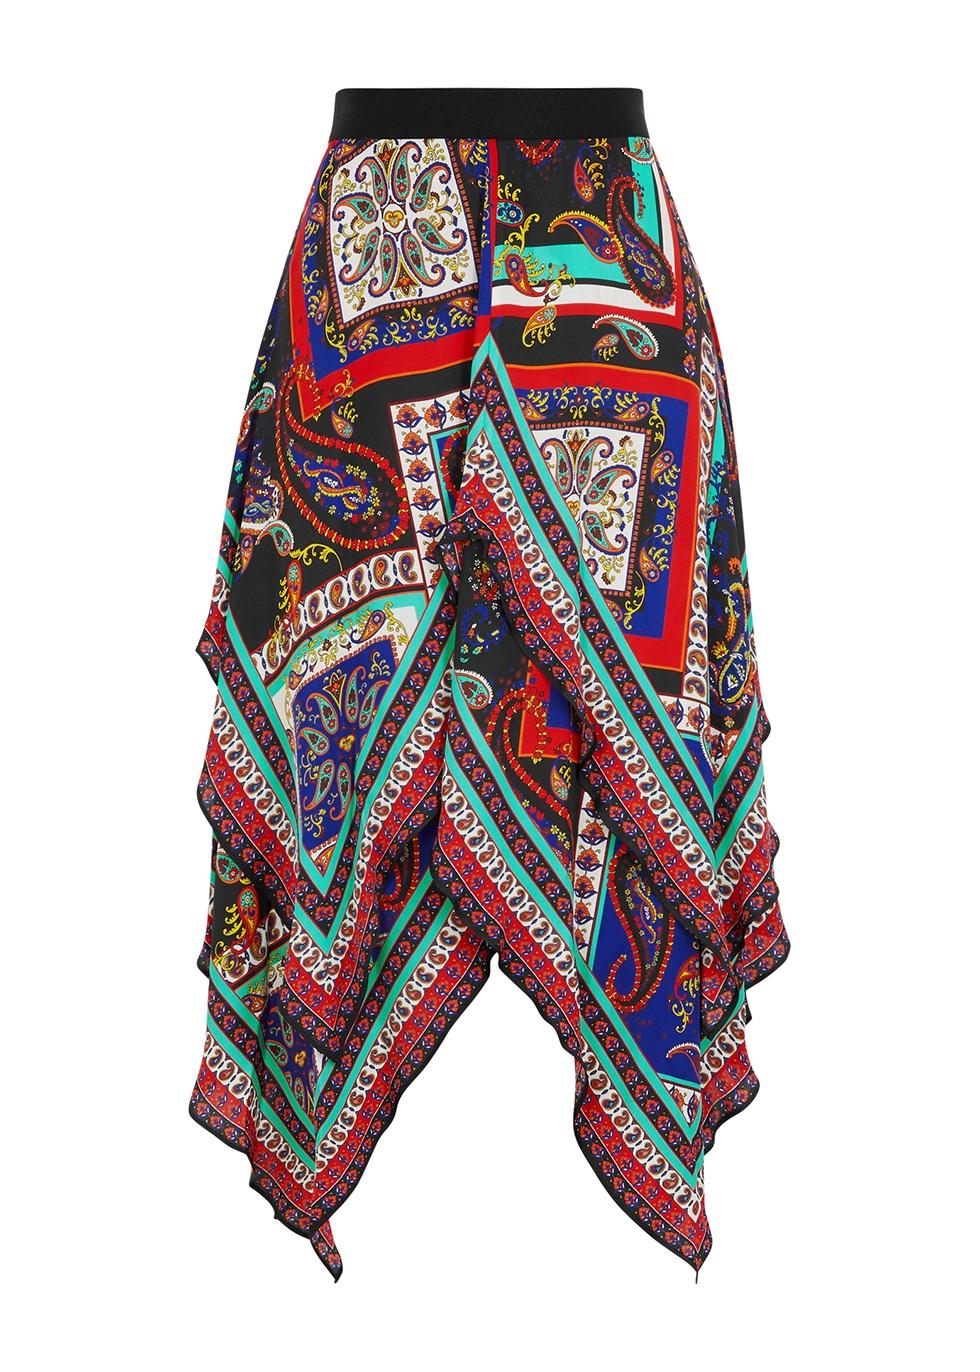 Maura printed asymmetric satin skirt